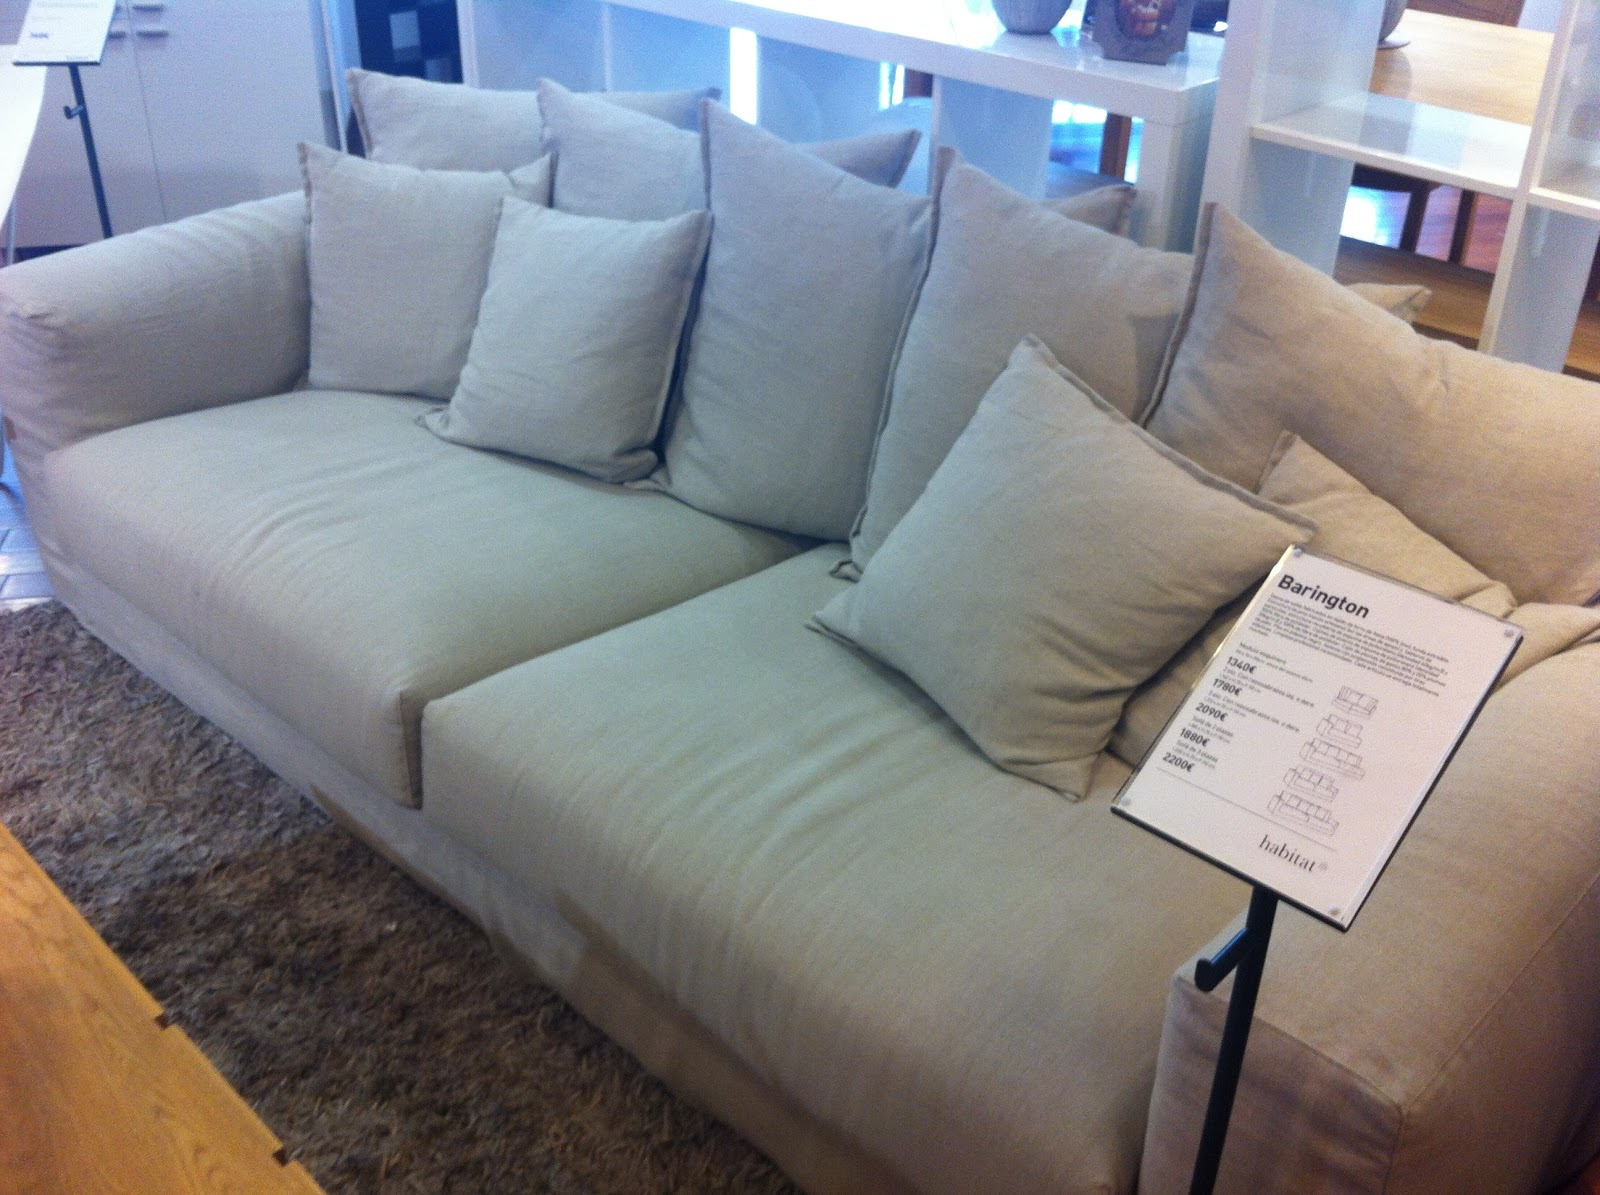 Tiendas sofas barcelona cool agora with tiendas sofas - Habitat muebles barcelona ...